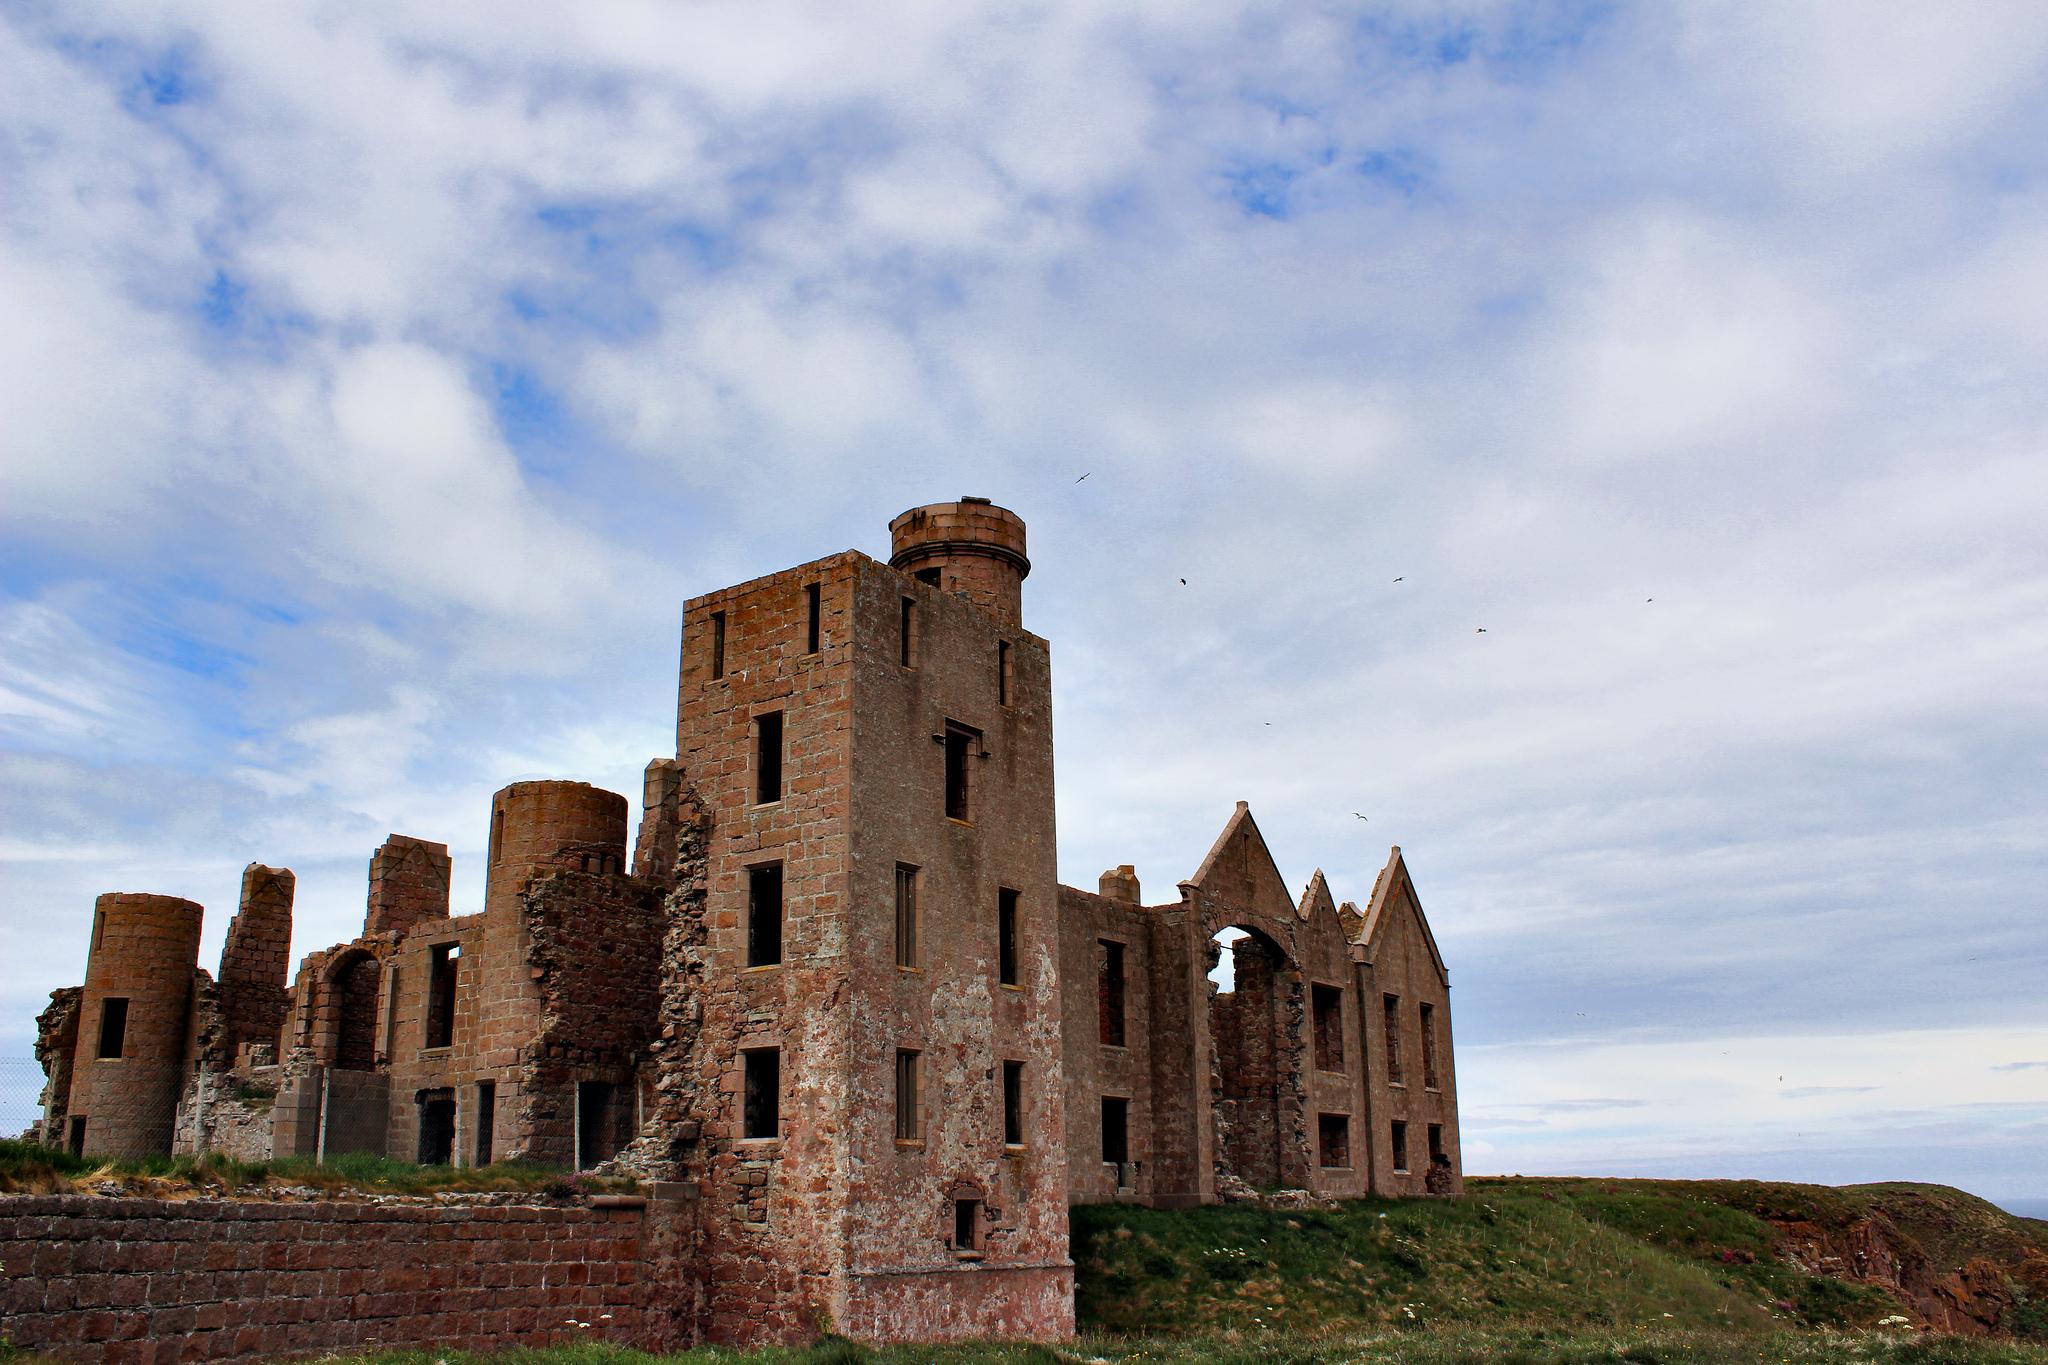 """New Slains Castle"" by Alice via Flickr Creative CommonsN"